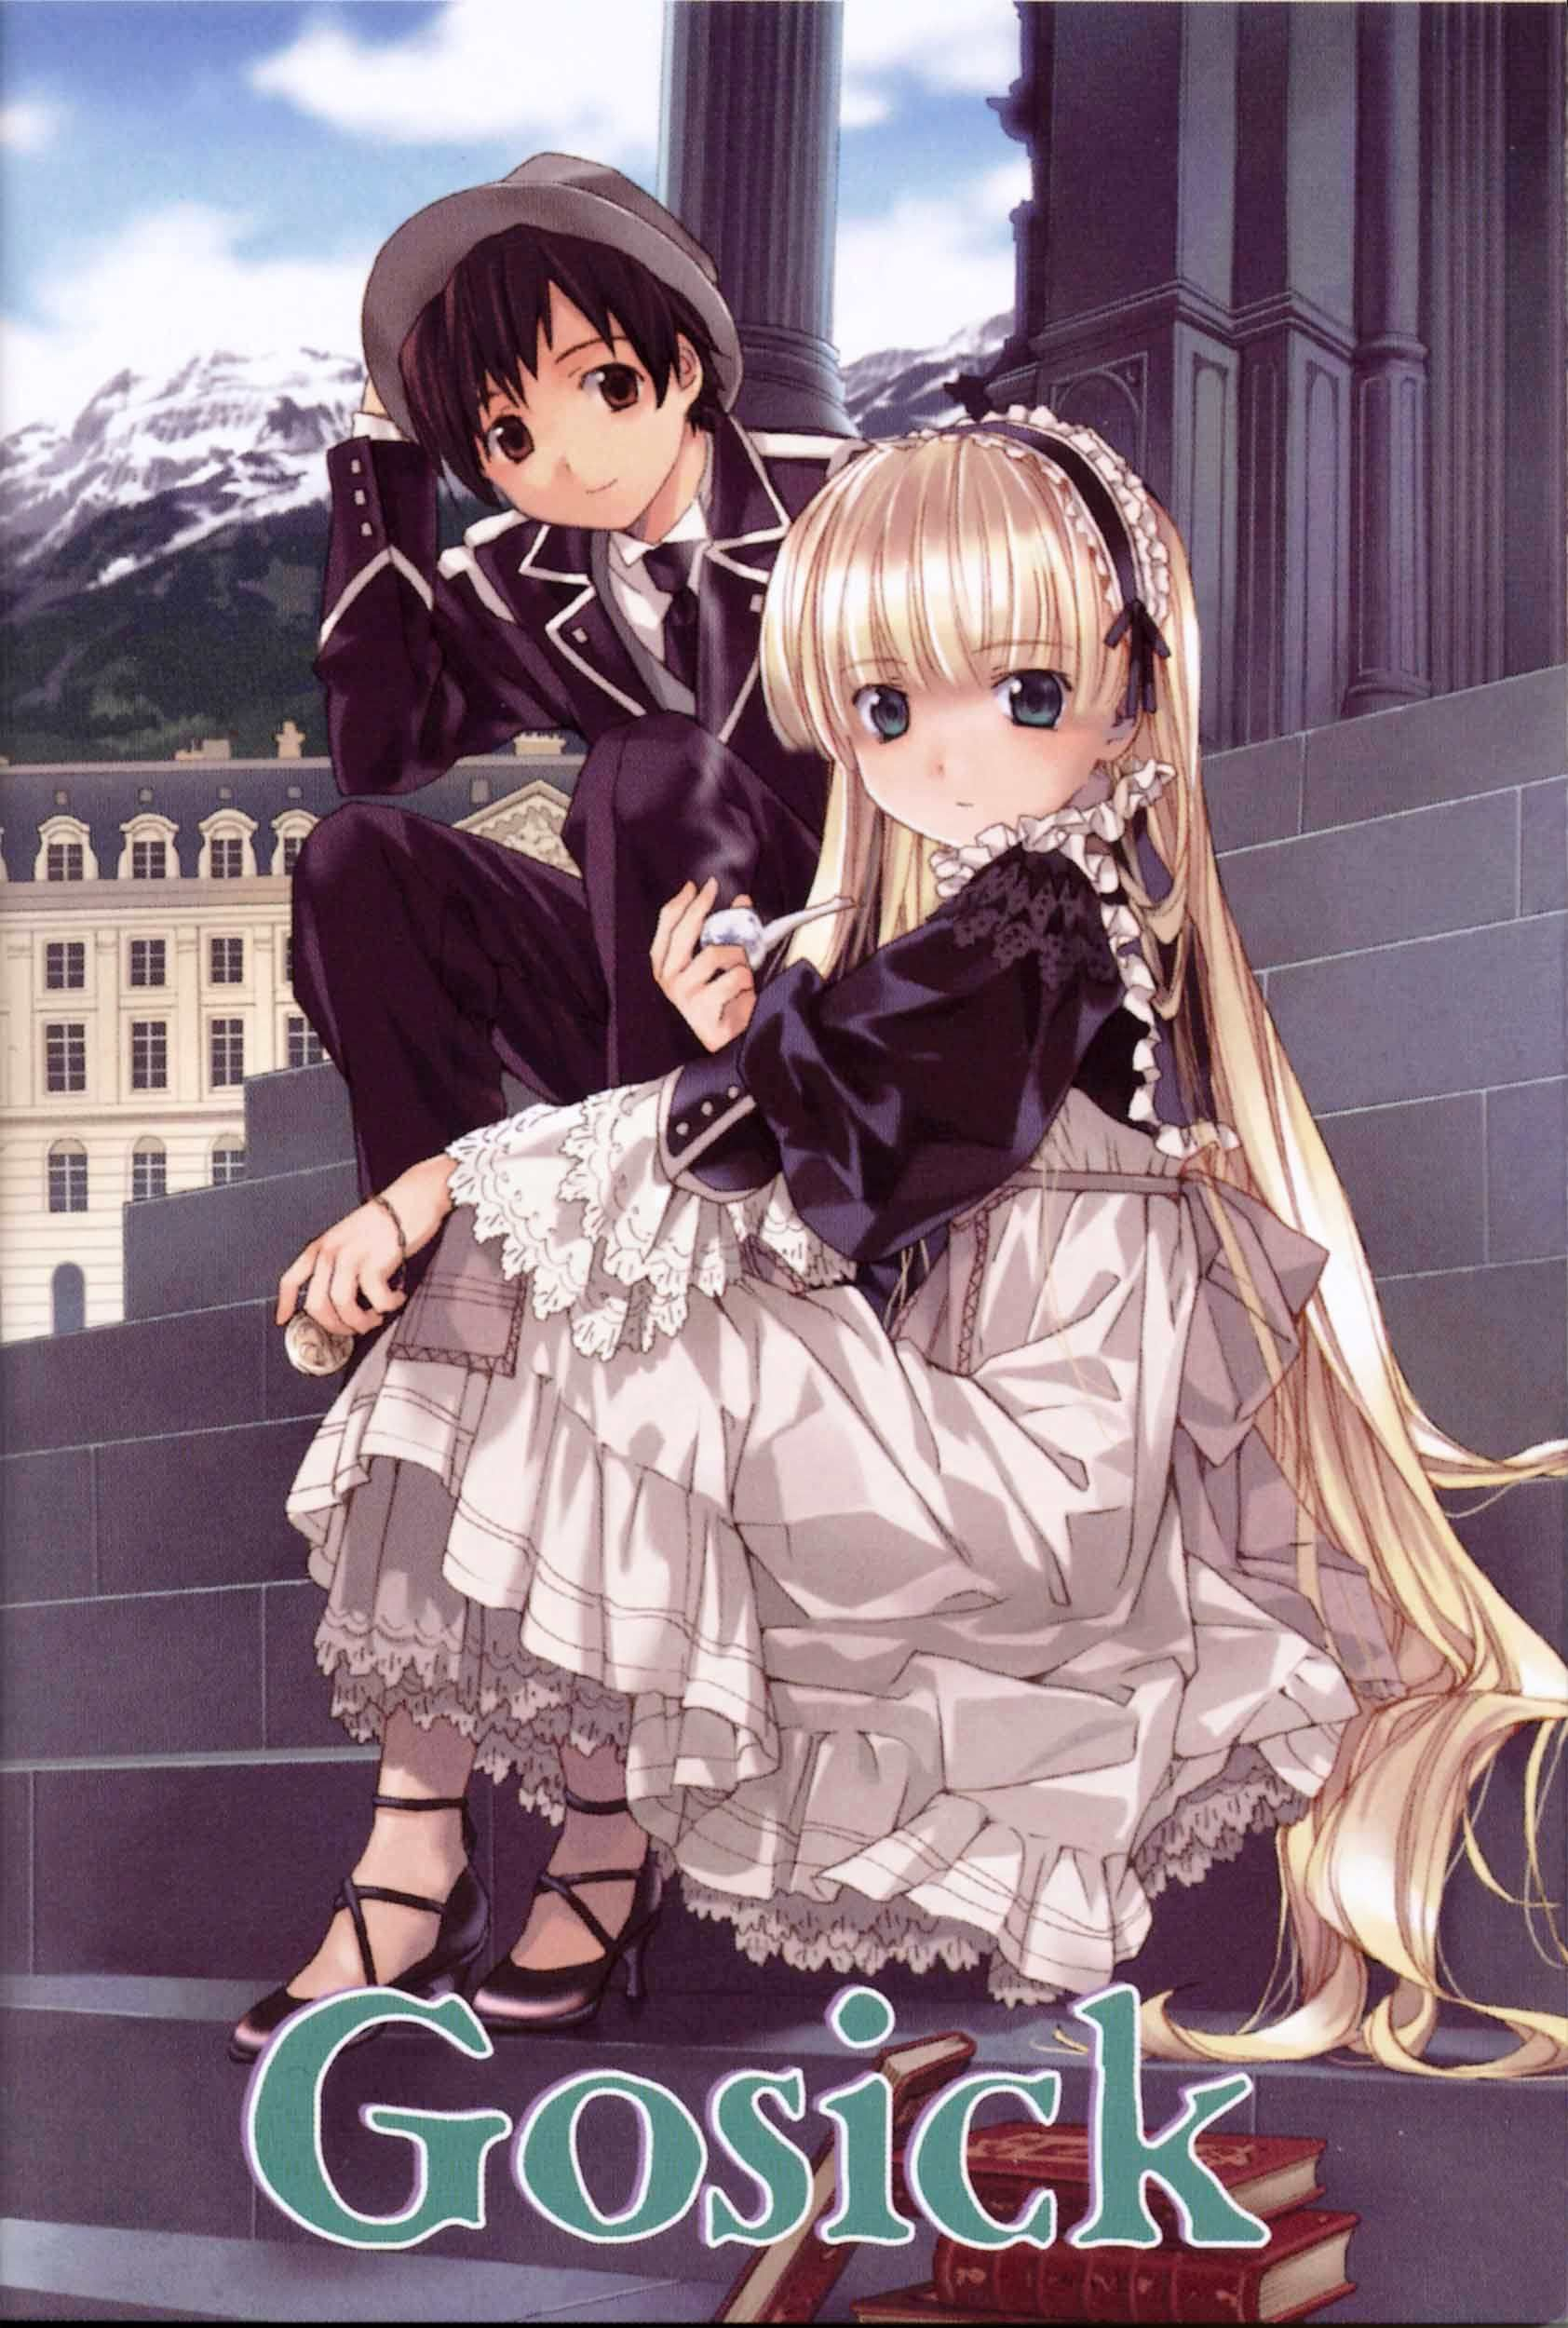 Gosick. One of my most favorite animes Anime, Sherlock